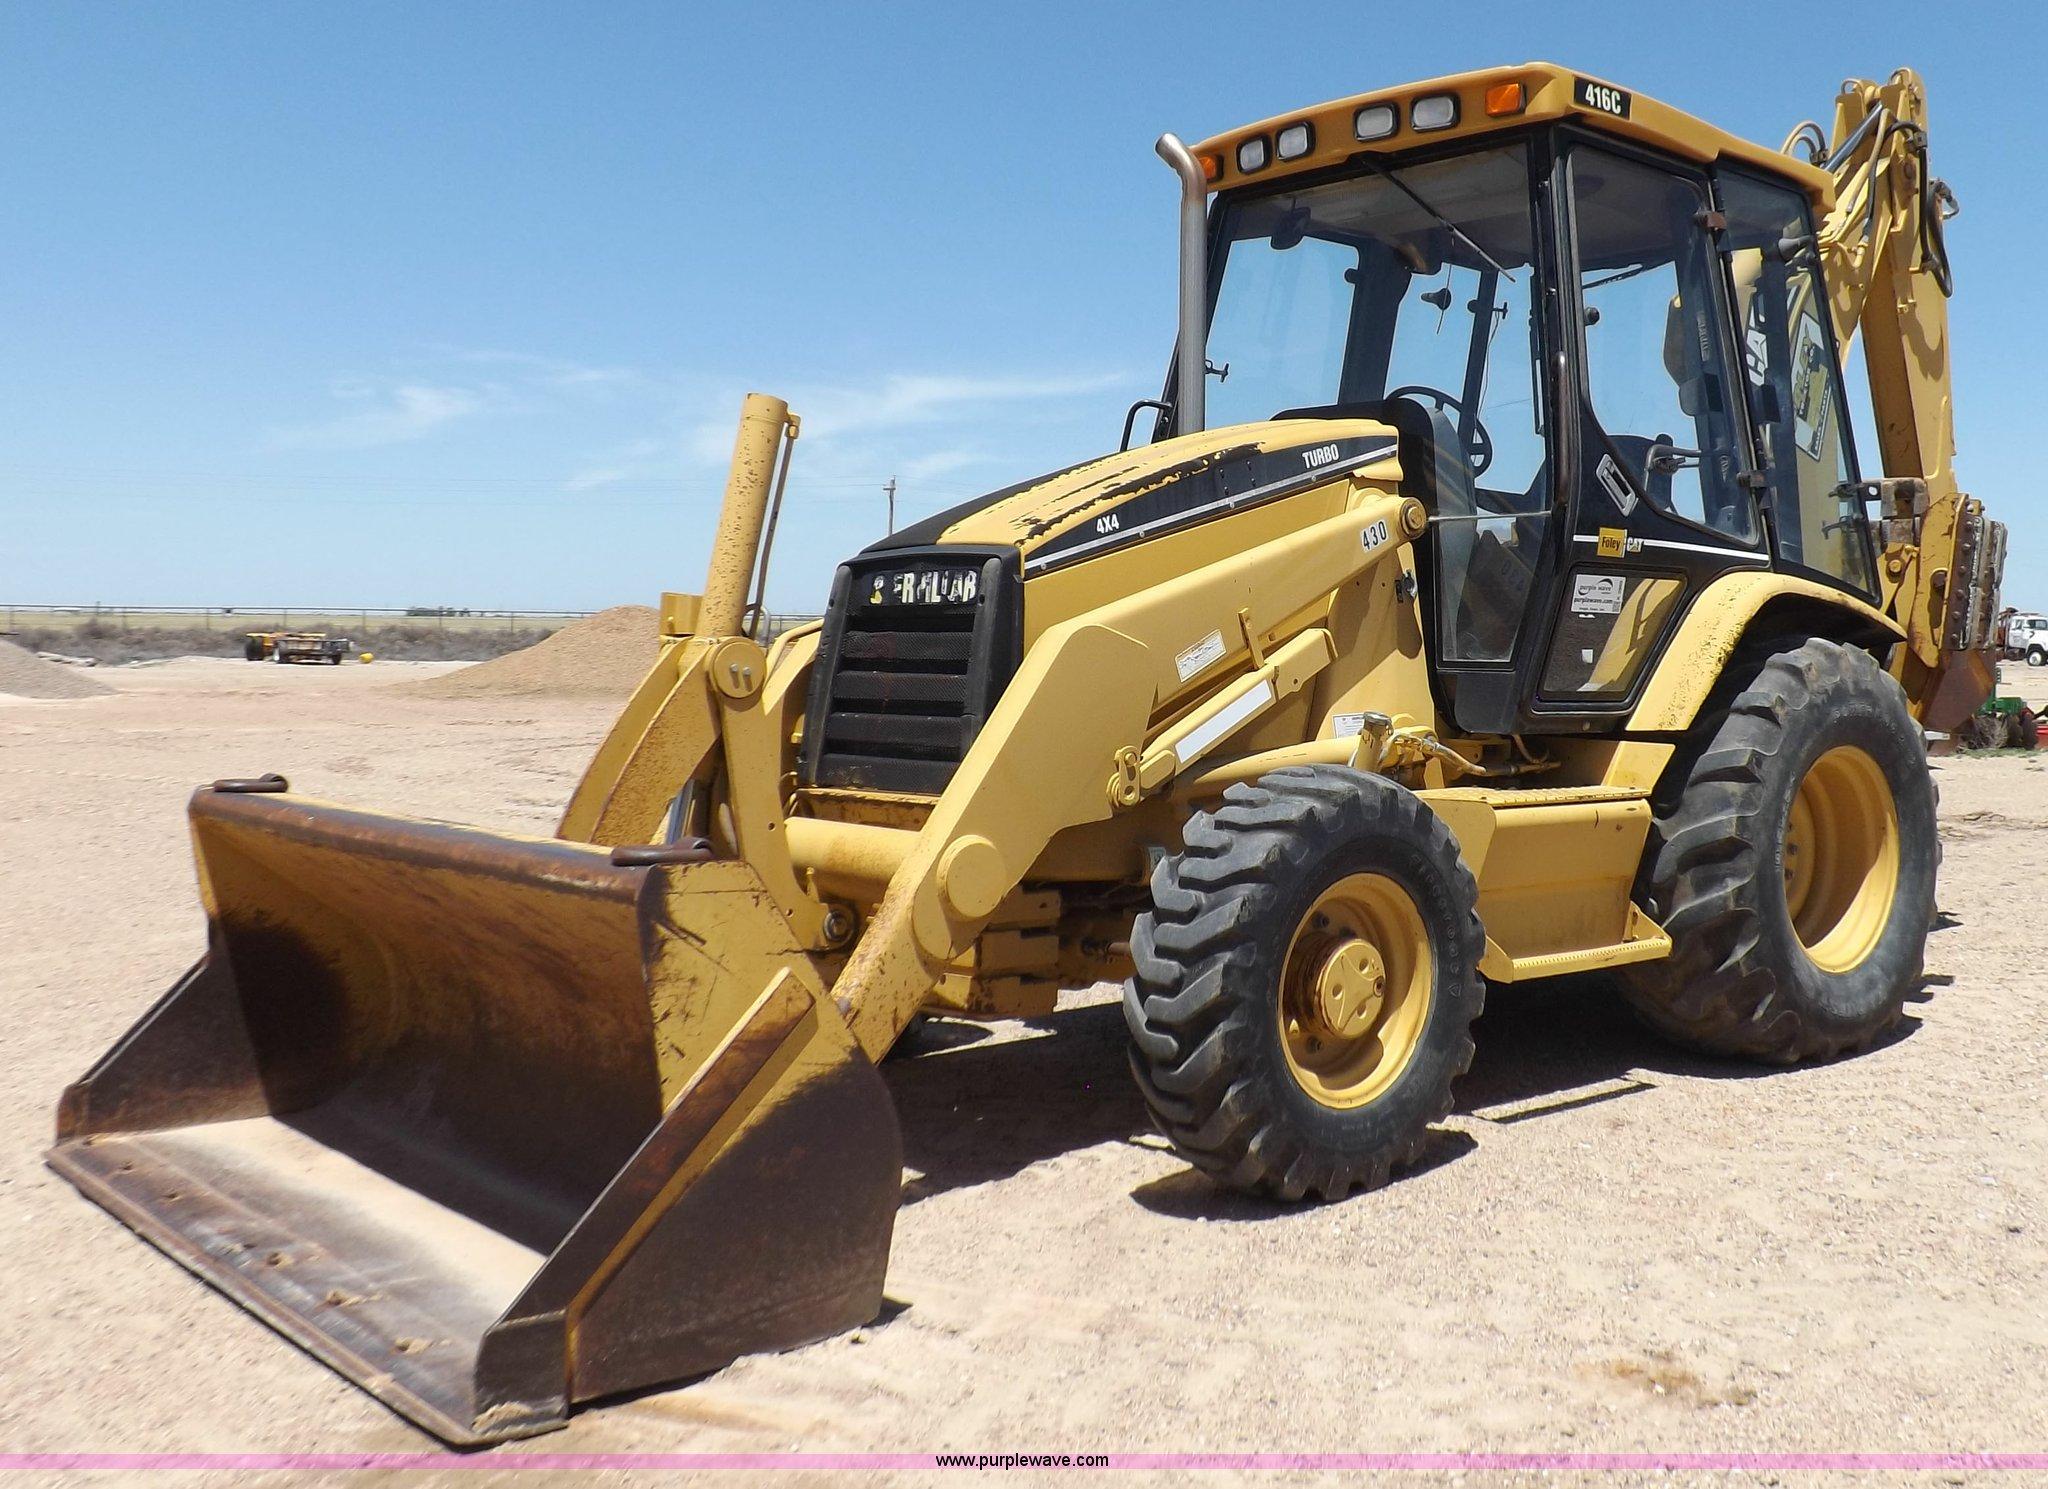 1998 Caterpillar 416C backhoe | Item K3969 | SOLD! July 16 C